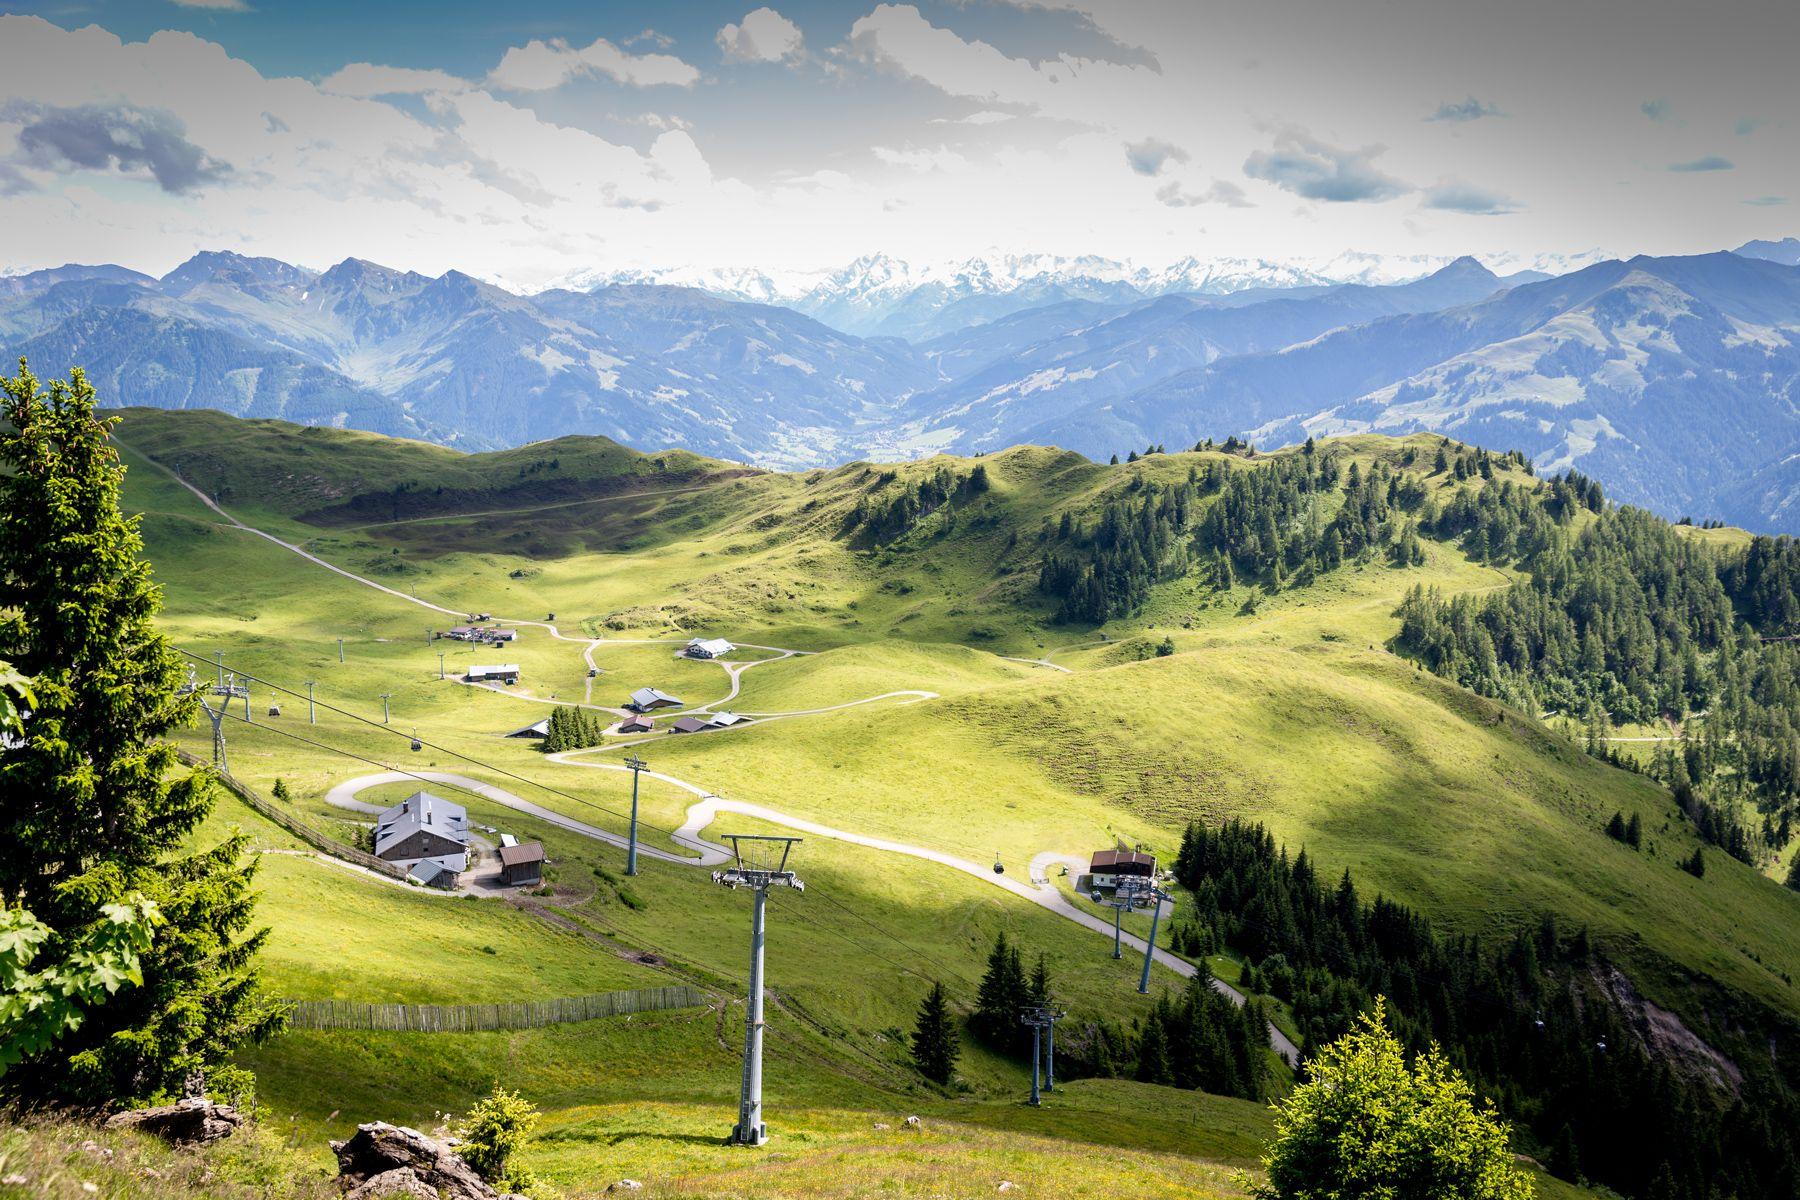 Kitzbuhel iStock 501138765 web